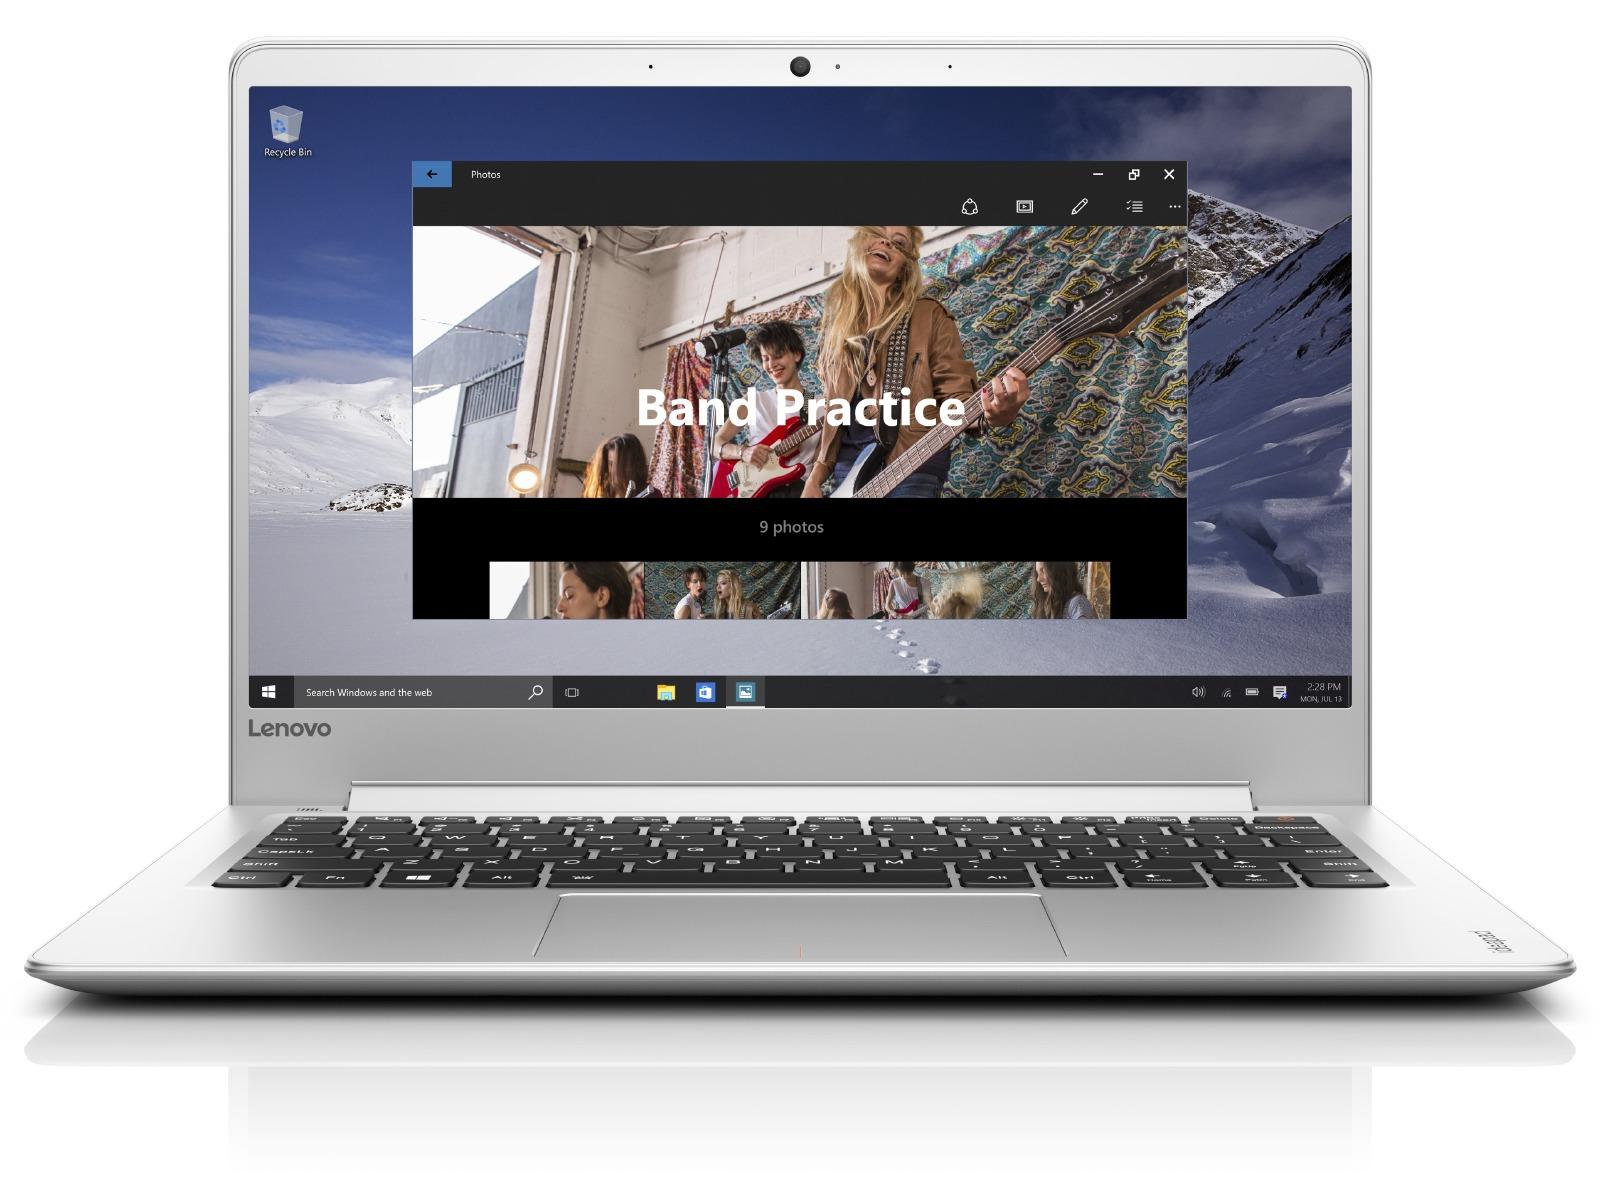 Lenovo IdeaPad 710S 13.3 FHD/I5-7200U/8G/256SSD/INT/W10 silver